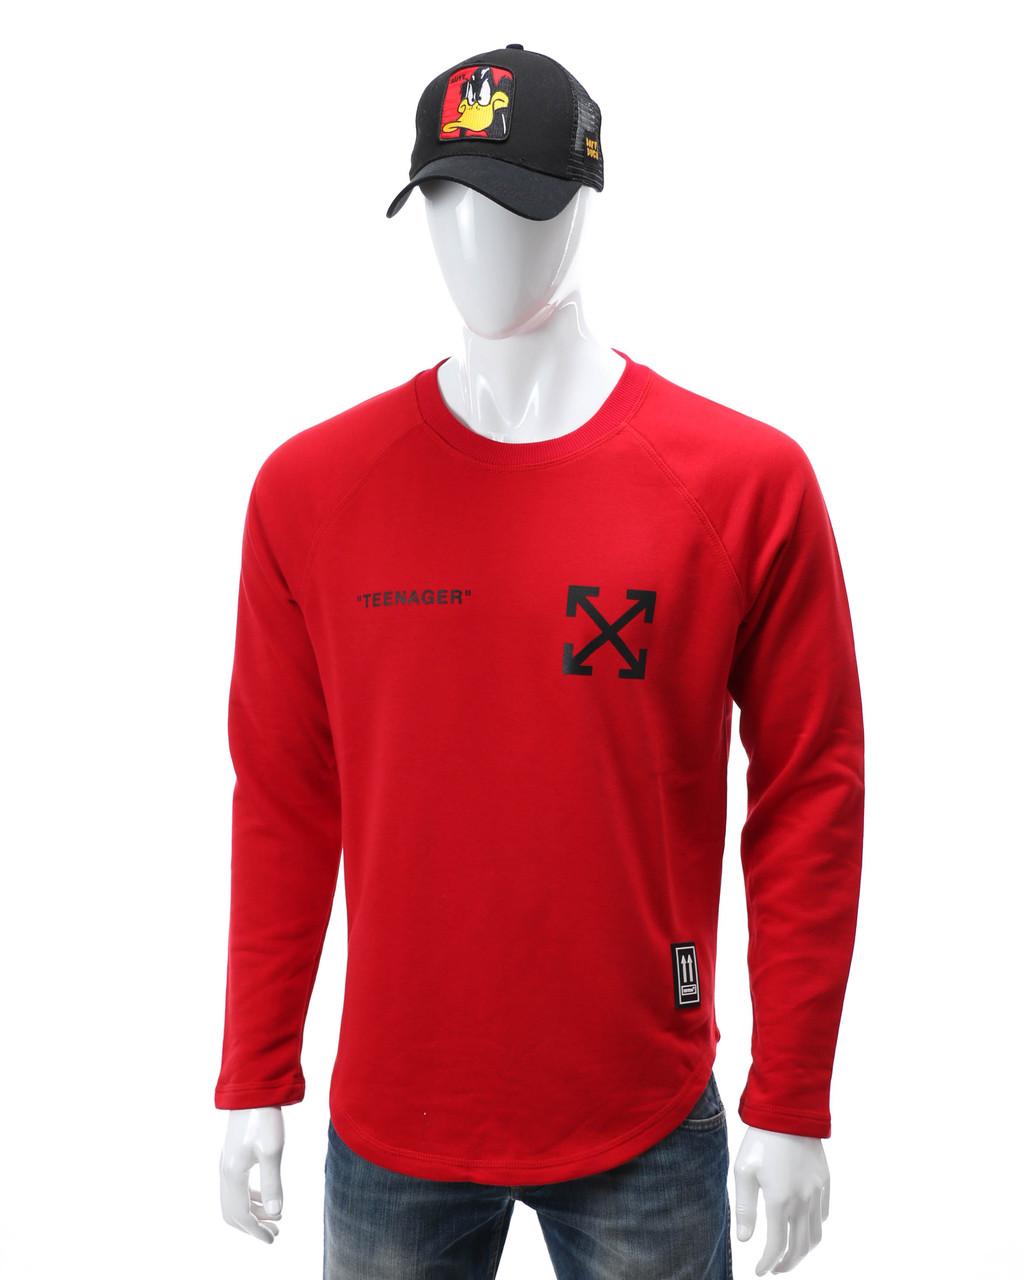 Свитшот красный OFF-WHITE teenager Р-2 RED L(Р) 20-511-201-001